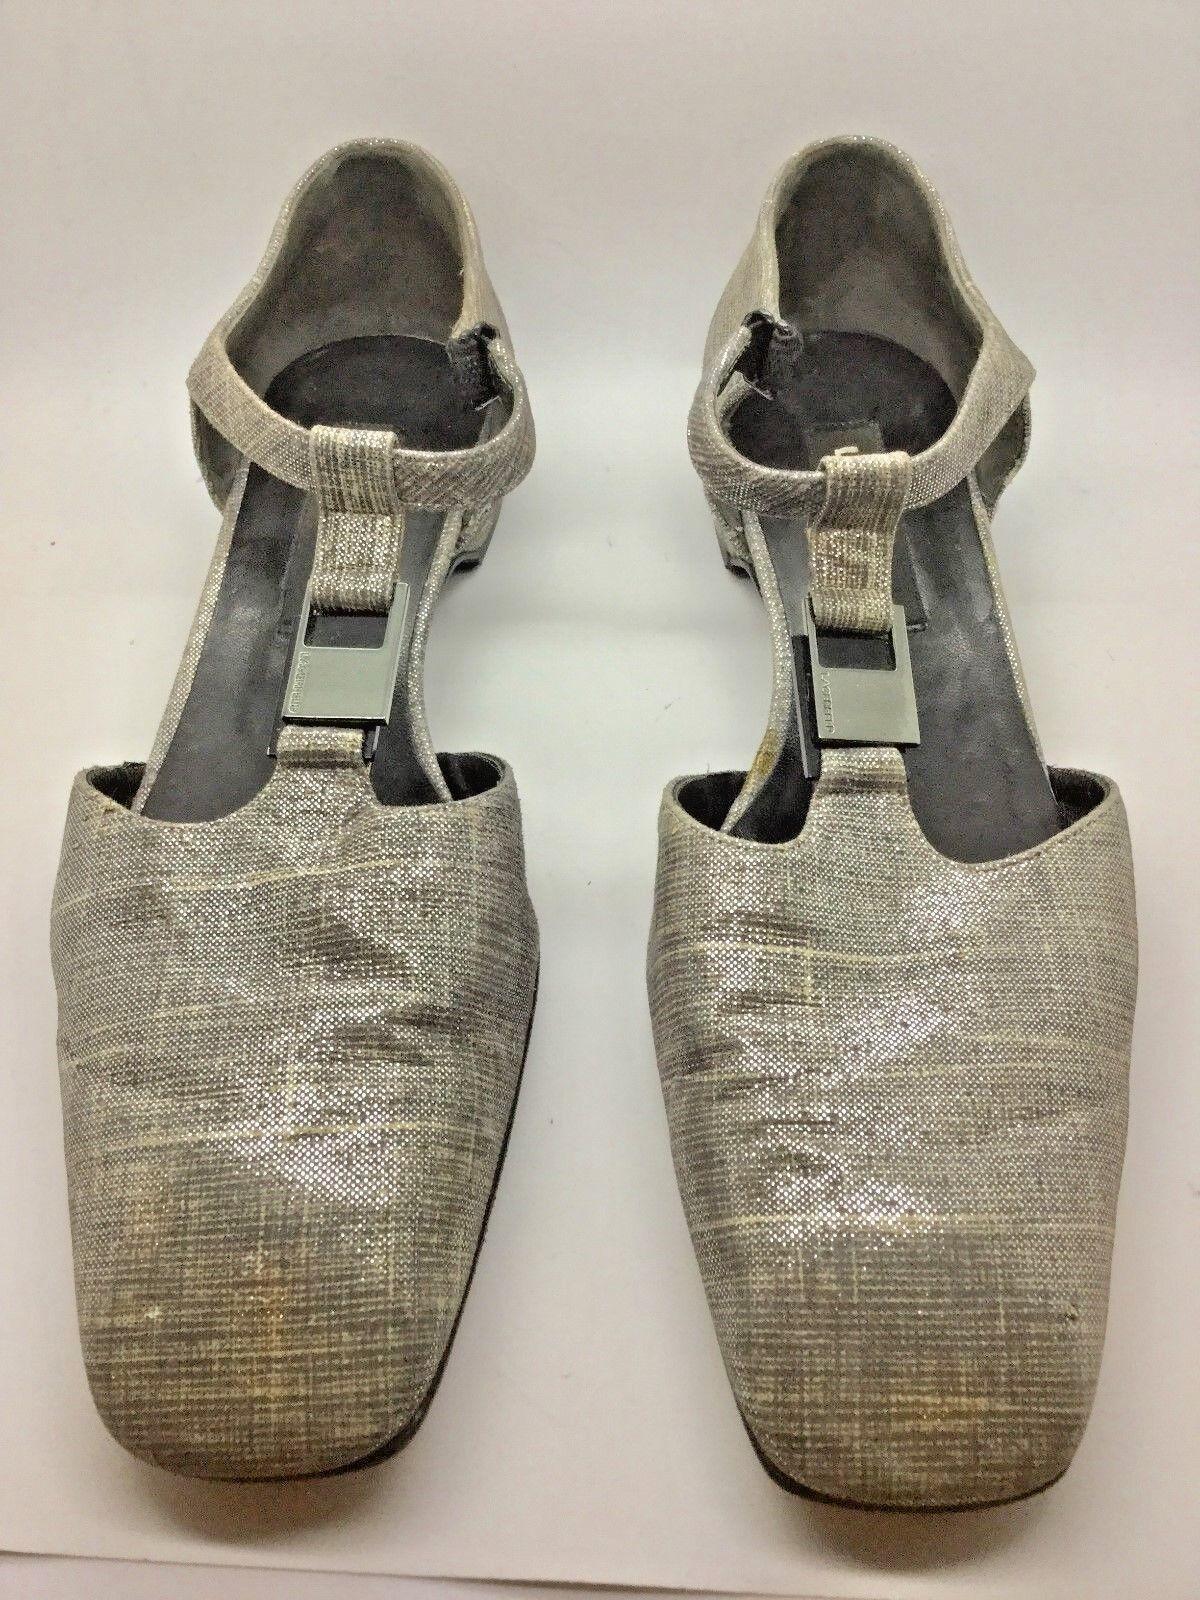 LAGERFELD Silver Metallic Flat Loafer Size 7.5